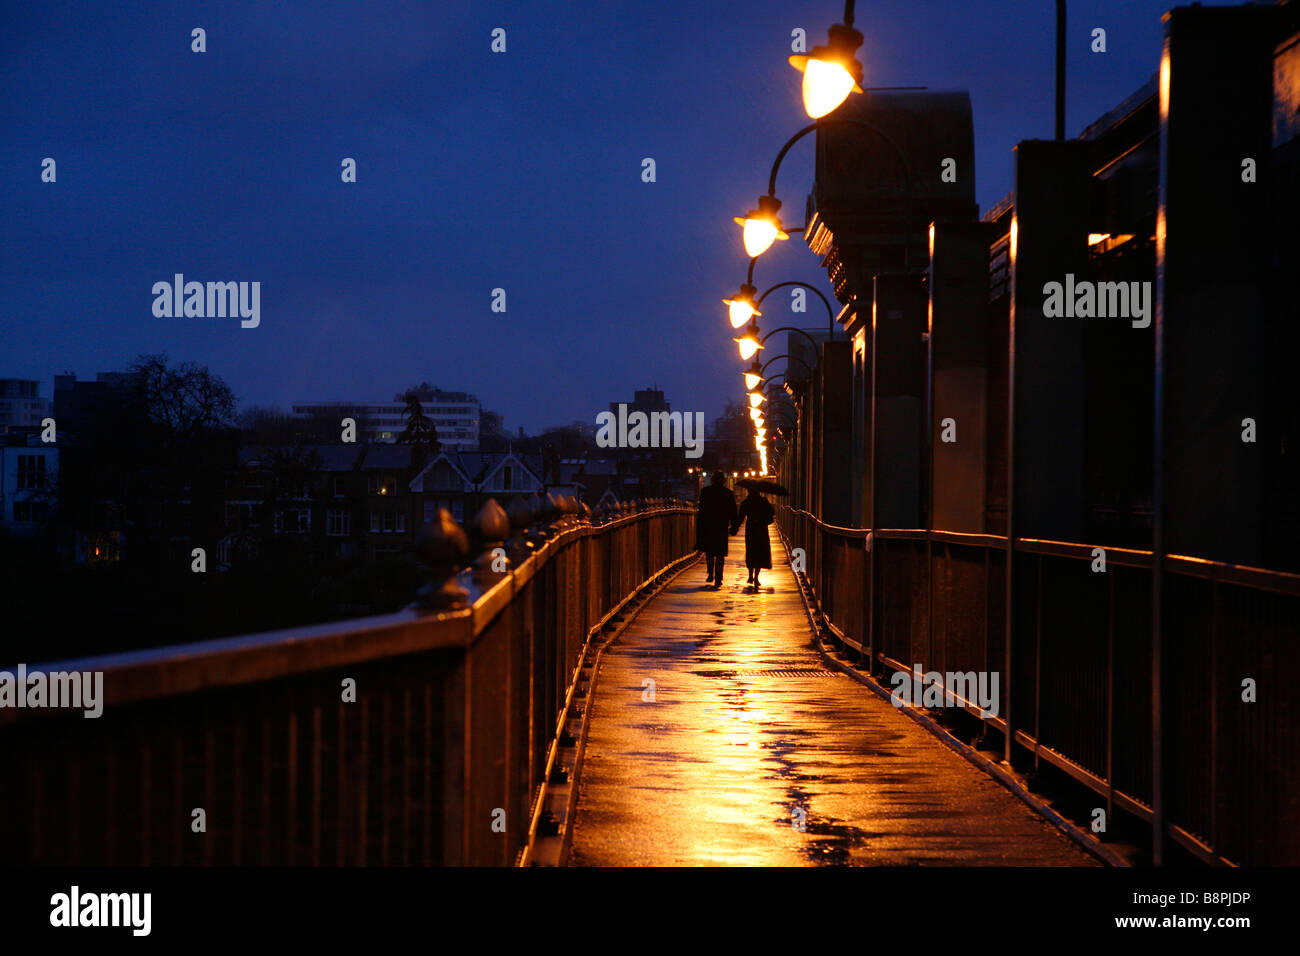 Pedestrians walking across a wet Fulham Rail Bridge, Fulham, London - Stock Image